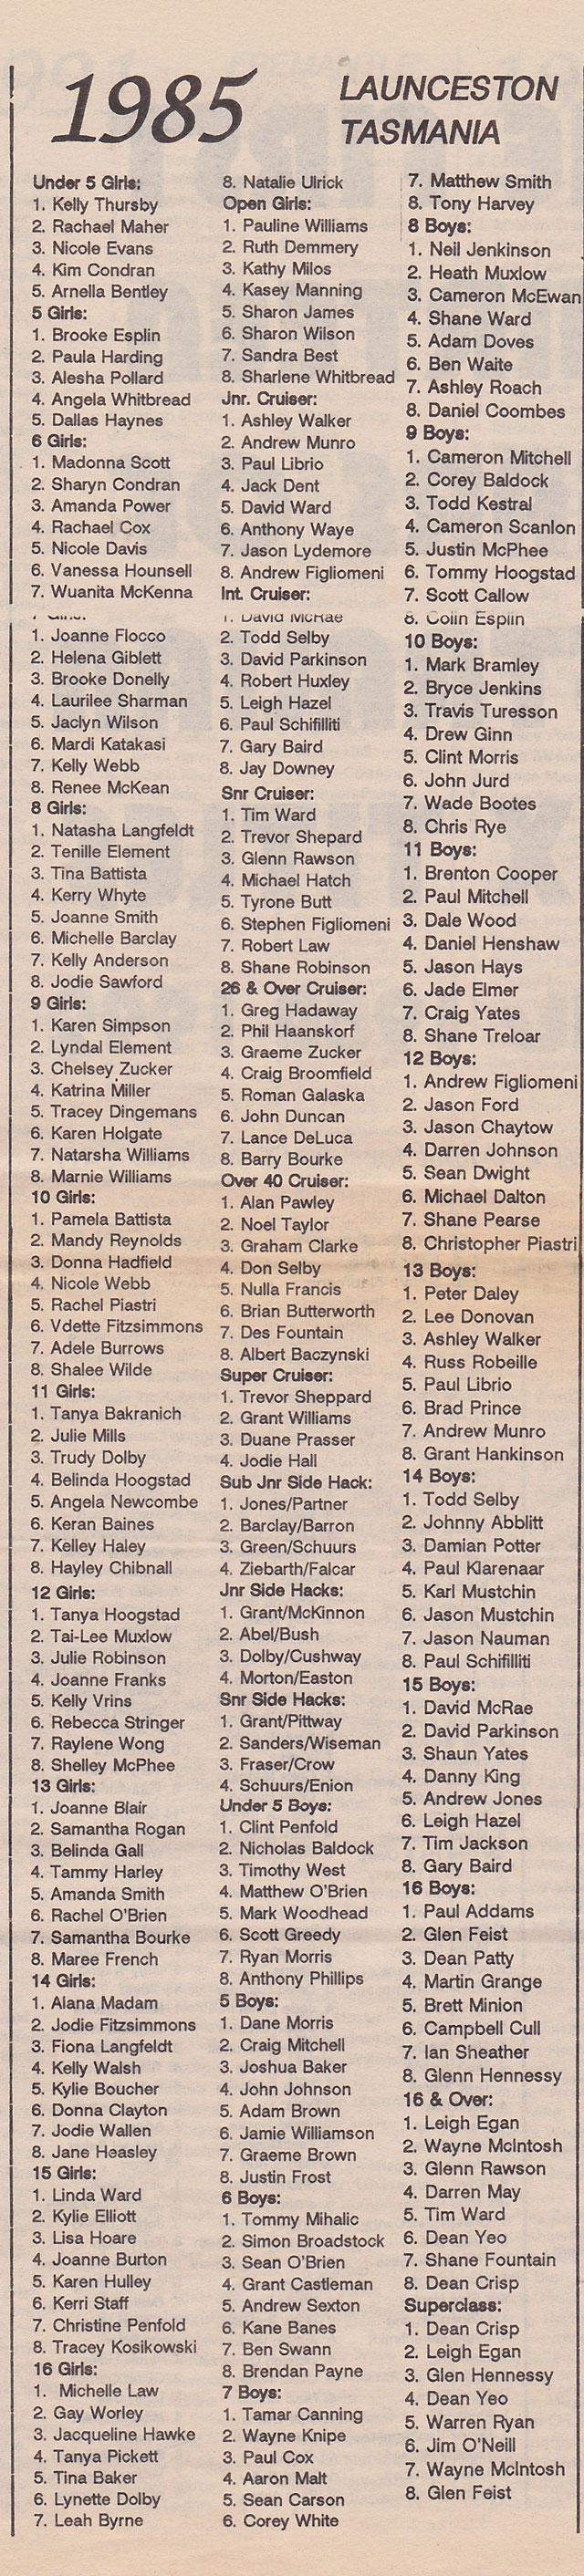 australian-bmx-championships-1985